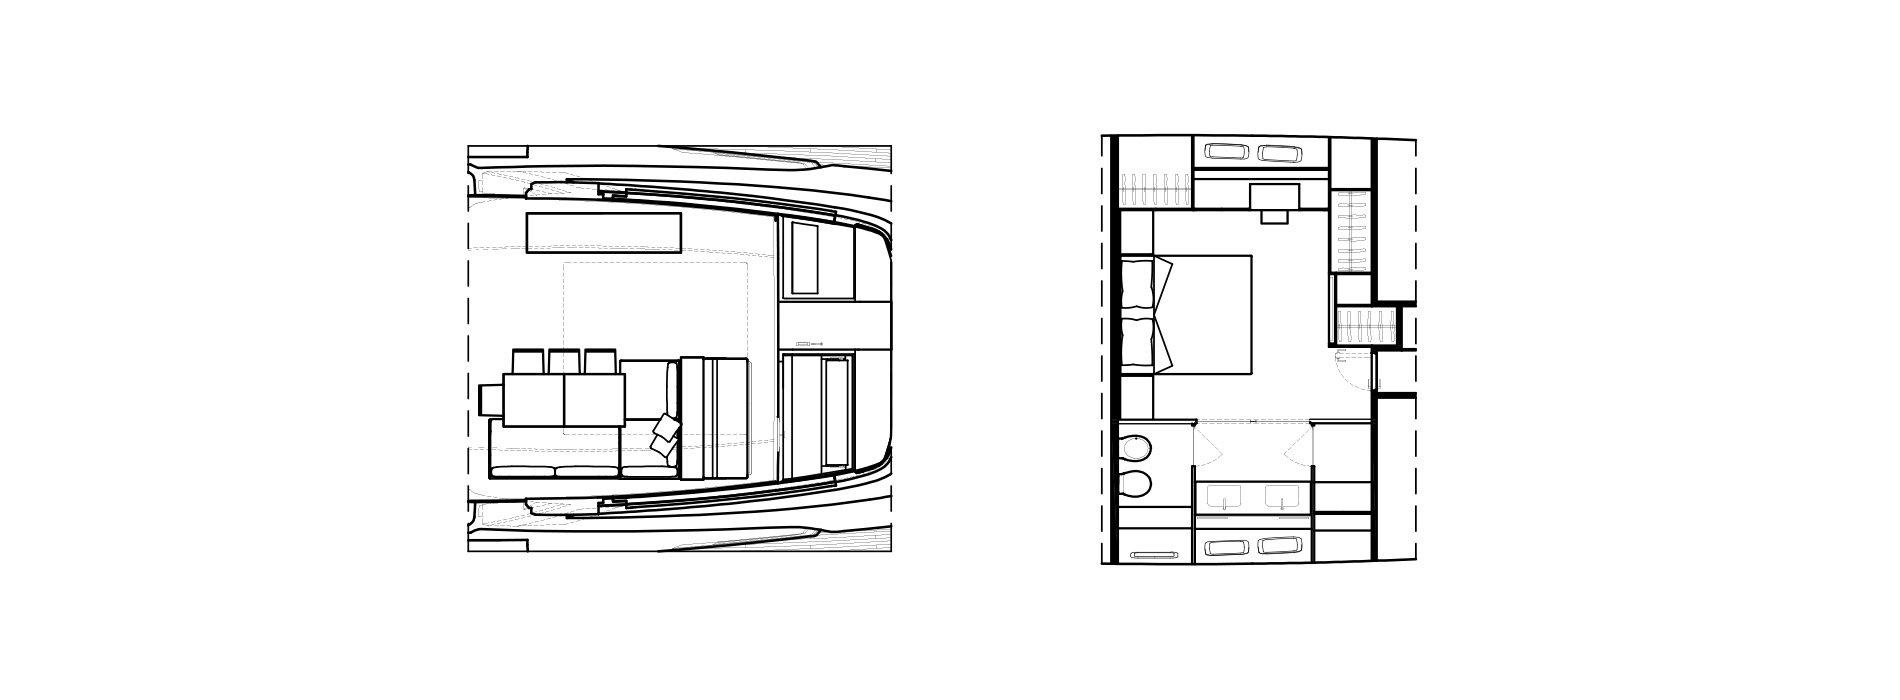 Sanlorenzo Yachts SX88 Details Versione A